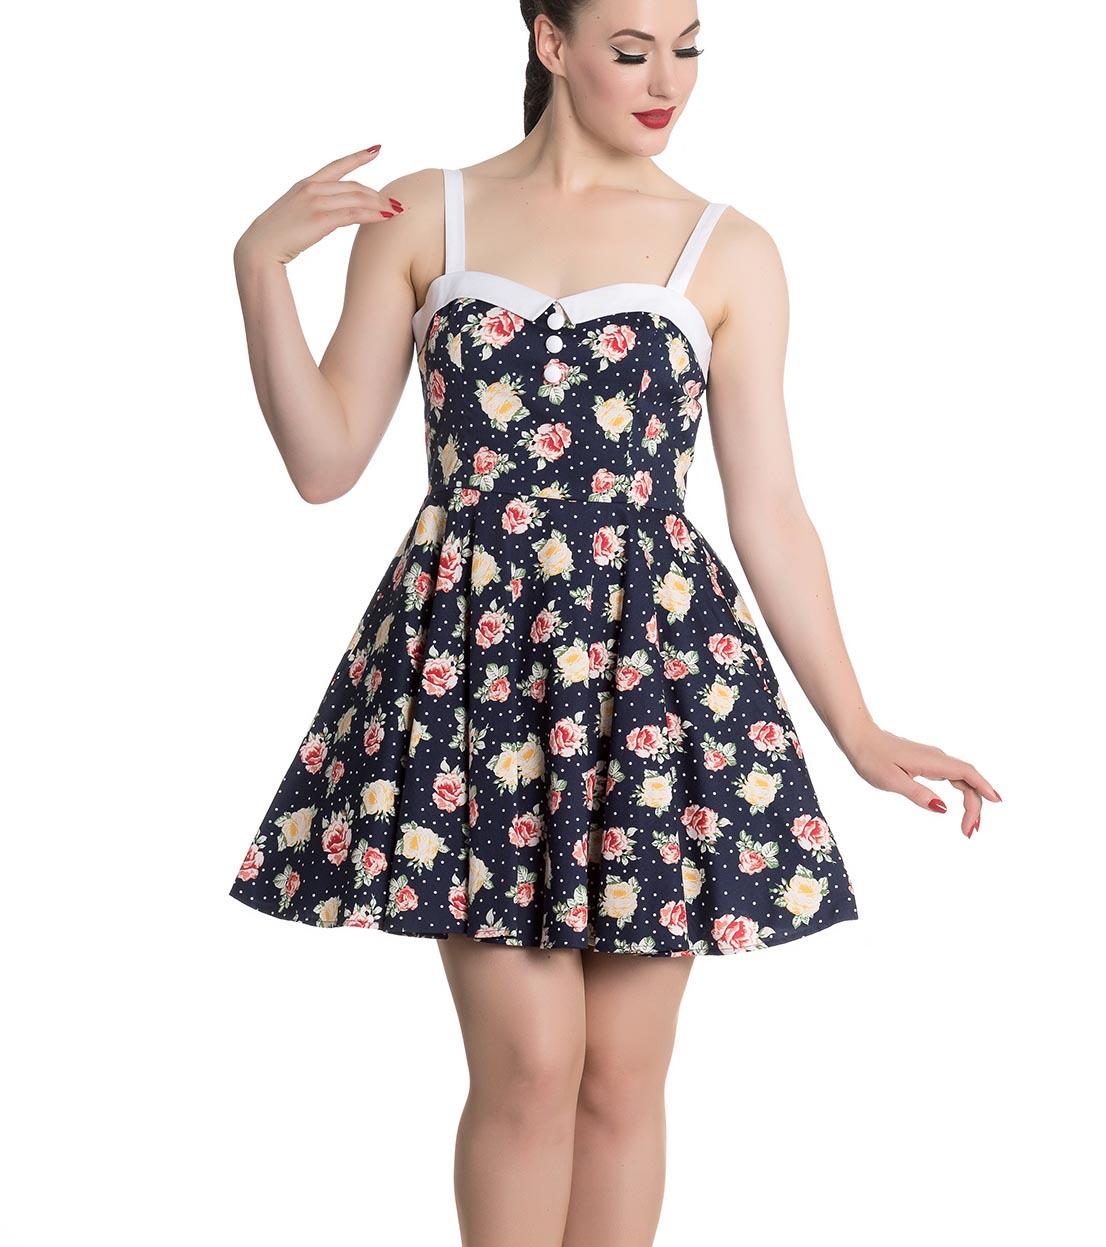 Hell-Bunny-Navy-Blue-Floral-Roses-Flowers-Mini-Dress-EMMA-Polka-Dot-All-Sizes thumbnail 19